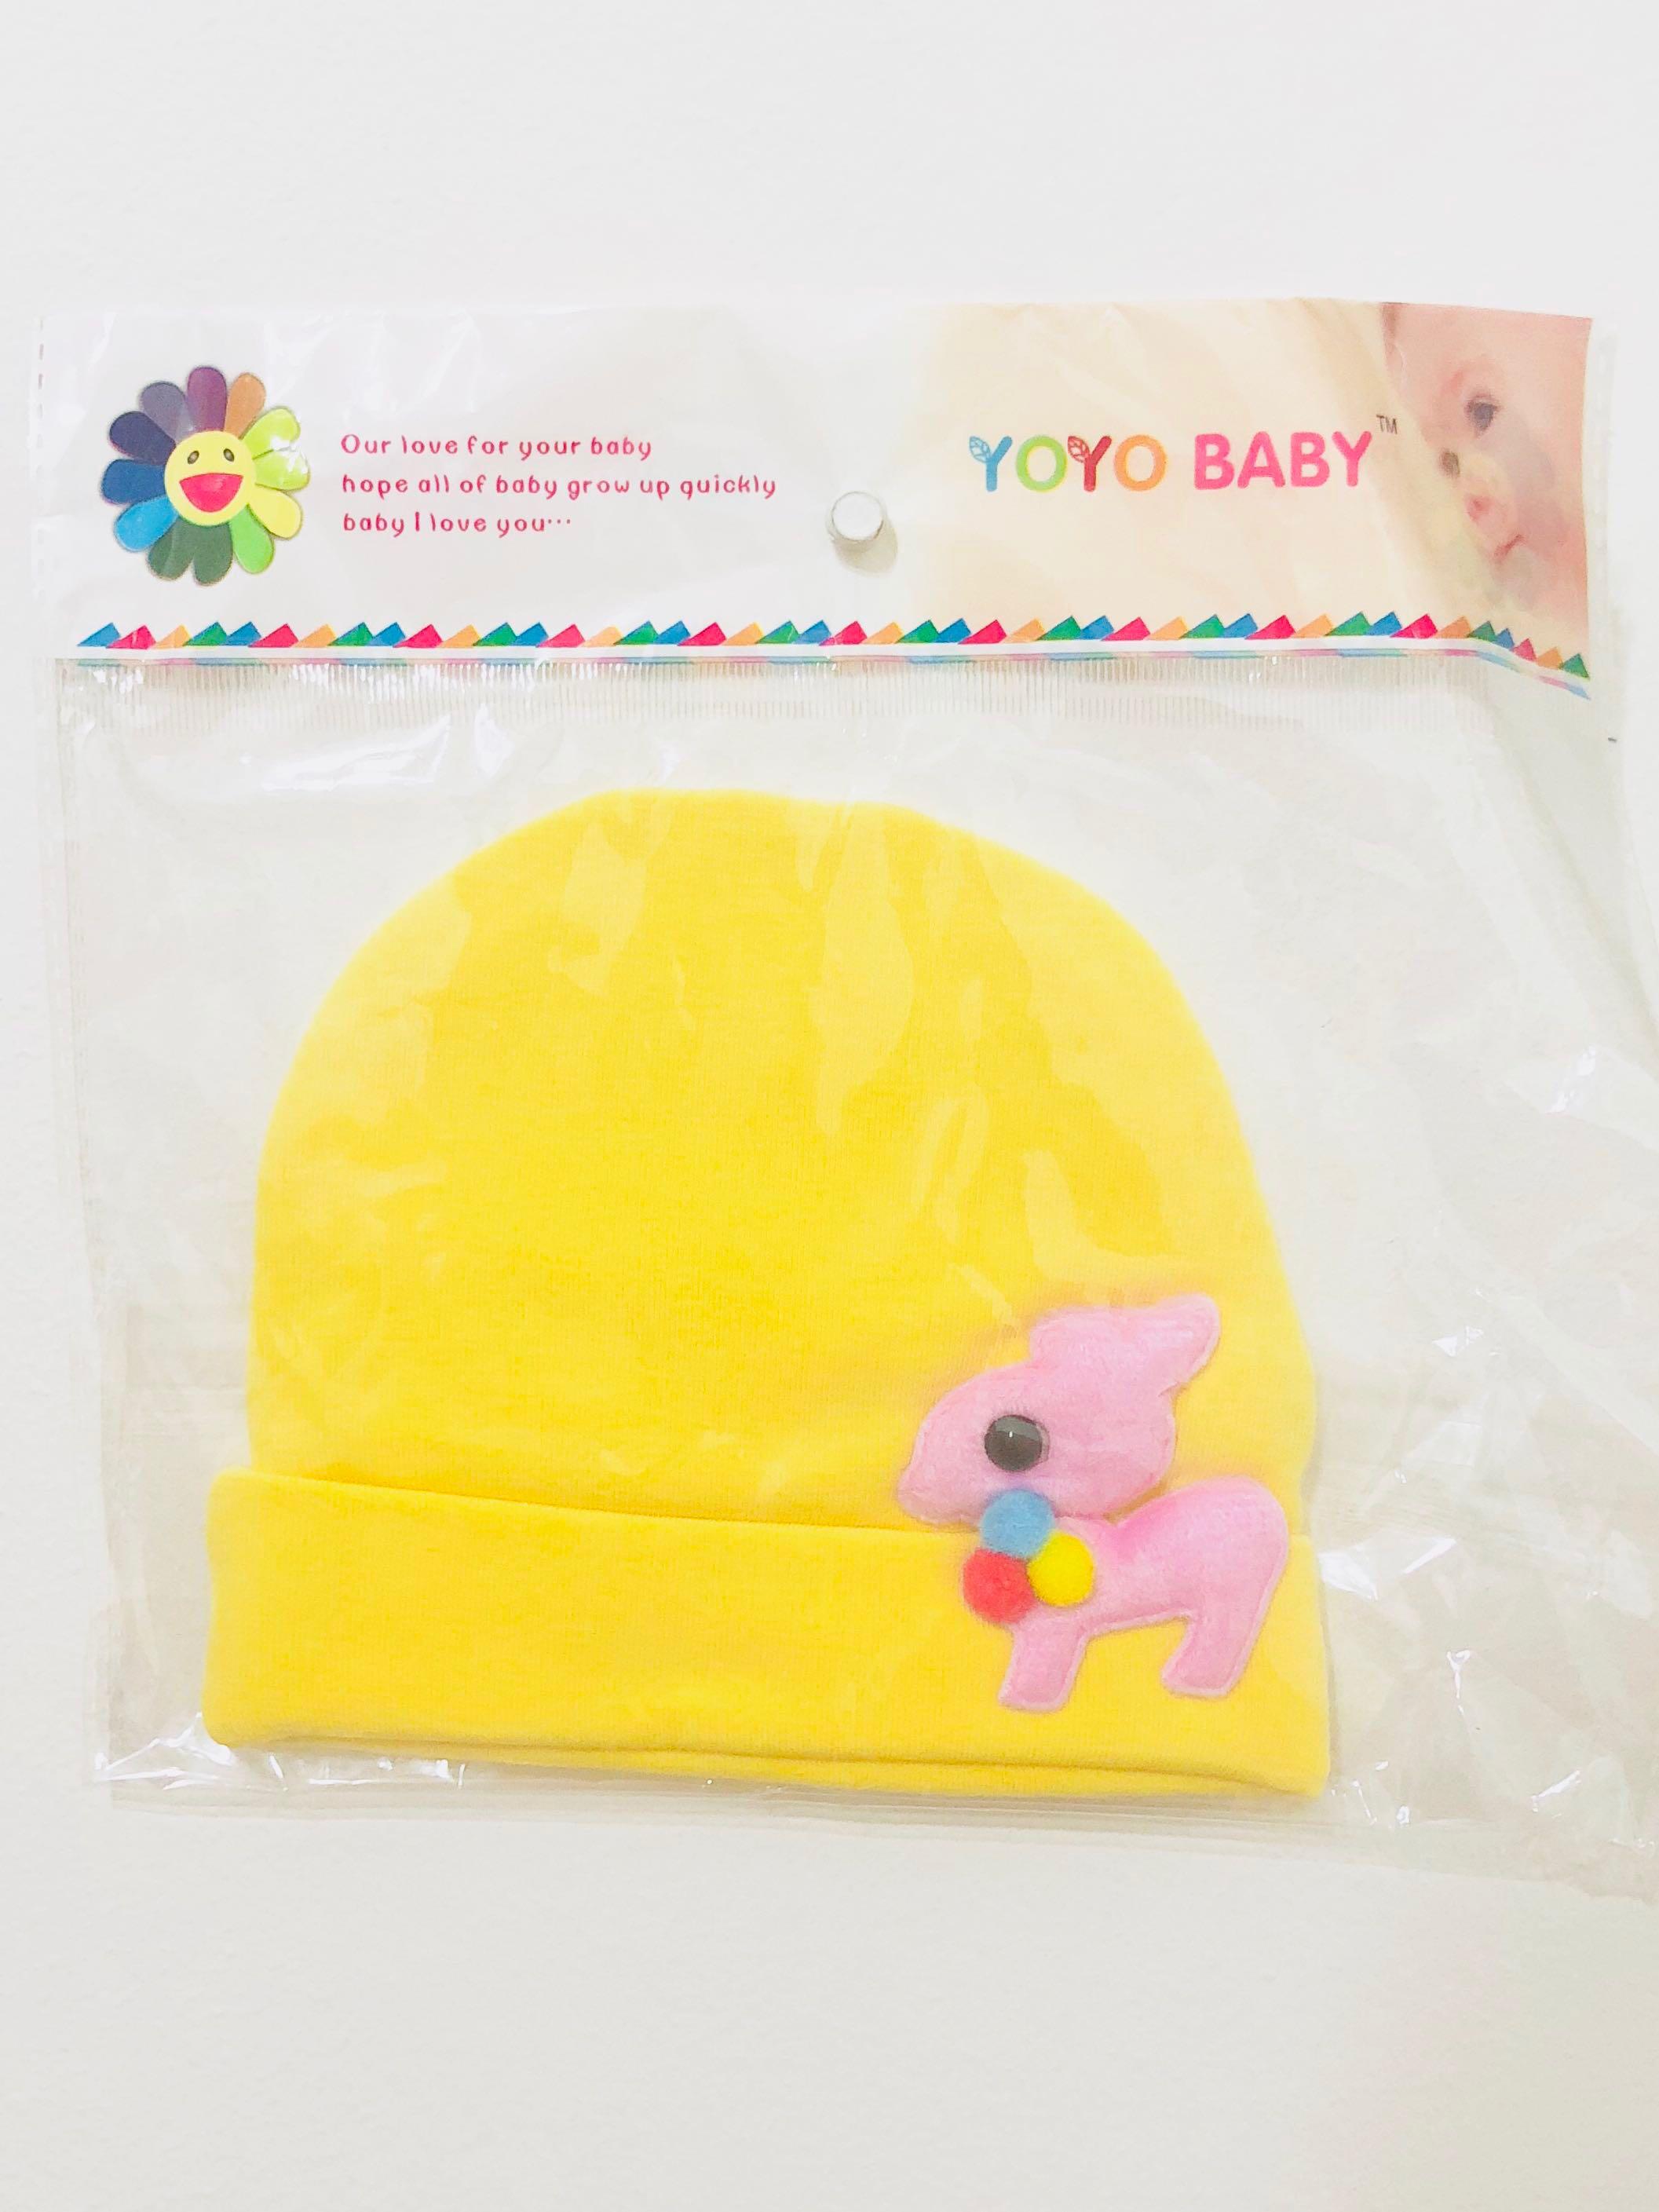 Yoyo Baby™ Newborn Baby Infant Cap   Hat   Beanie (Yellow Color) 9e9e57e300a